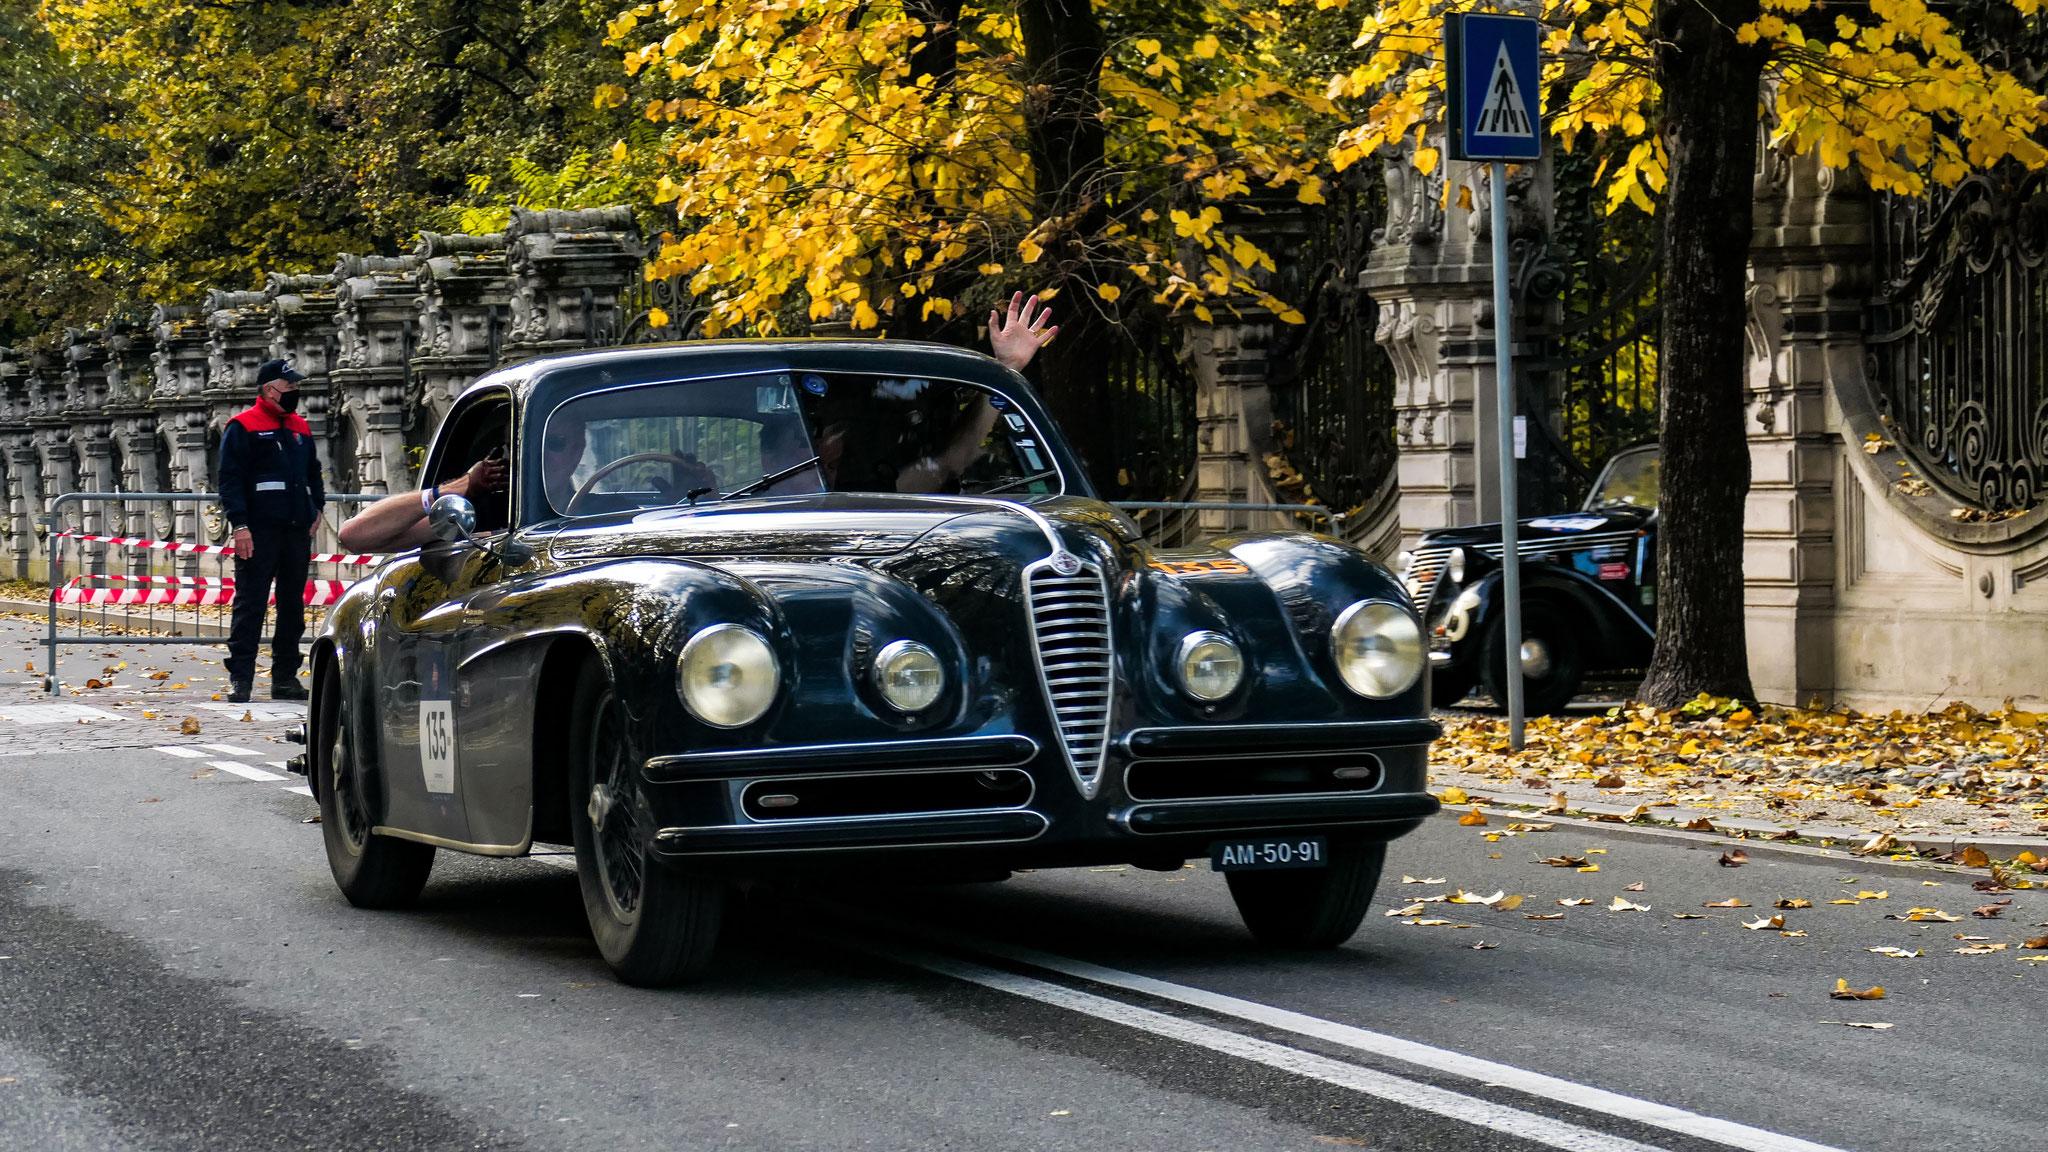 Alfa Romeo 6C 2500 SS Touring Coupe - AM-50-91 (NL)